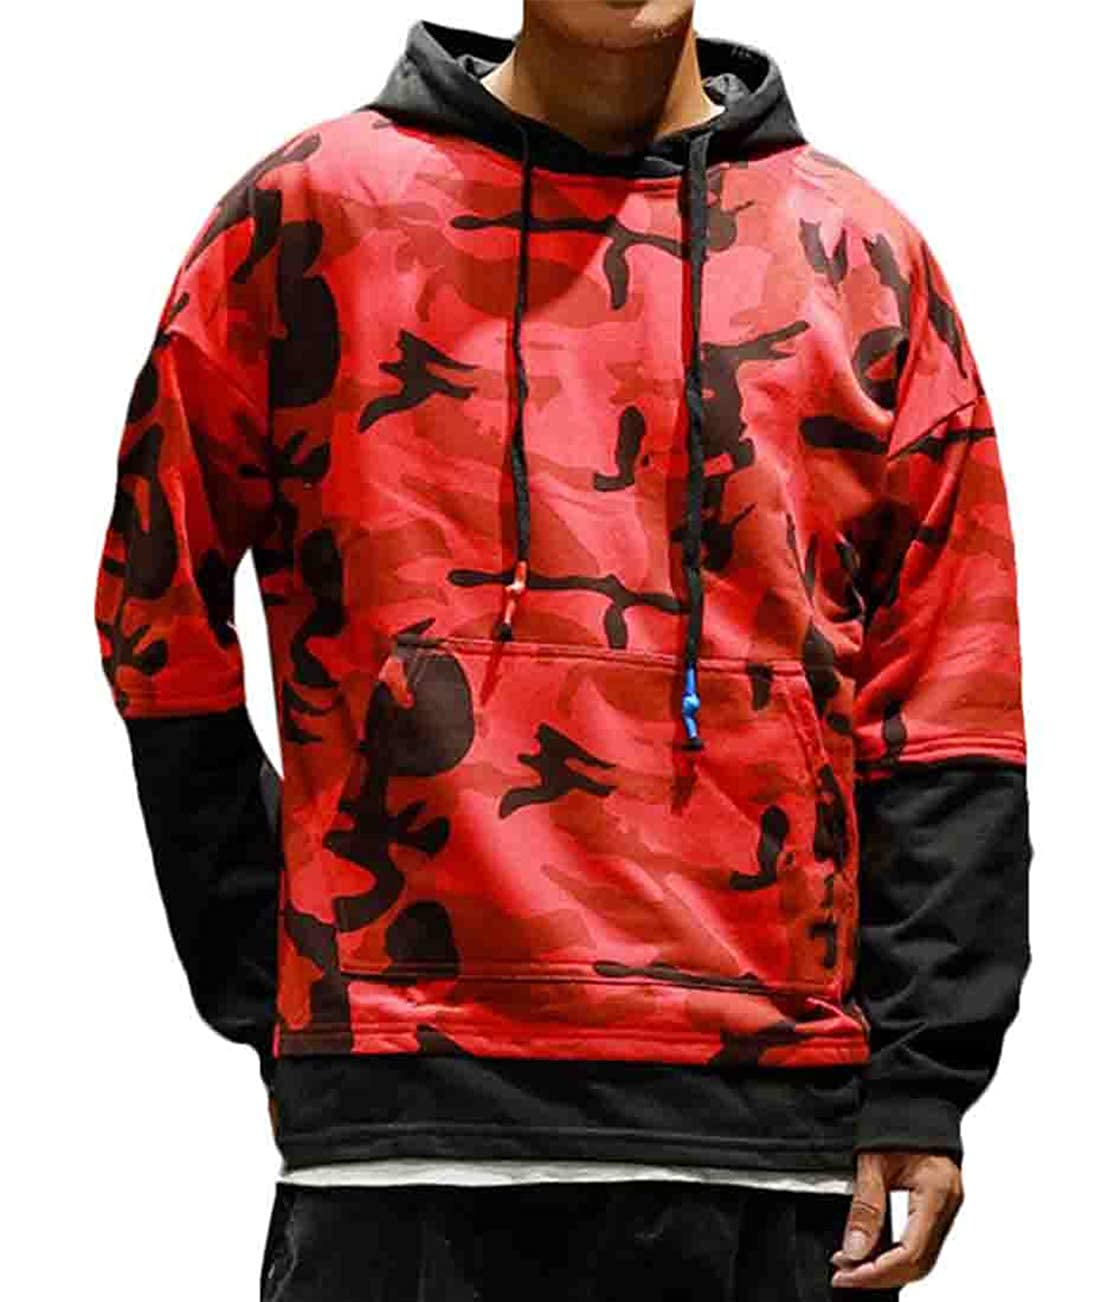 Hilization Men Fashion Autumn Hip-hop Patchwork Hooded Camouflage Kangaroo Pocket Sweatshirt Hoodie Pullover